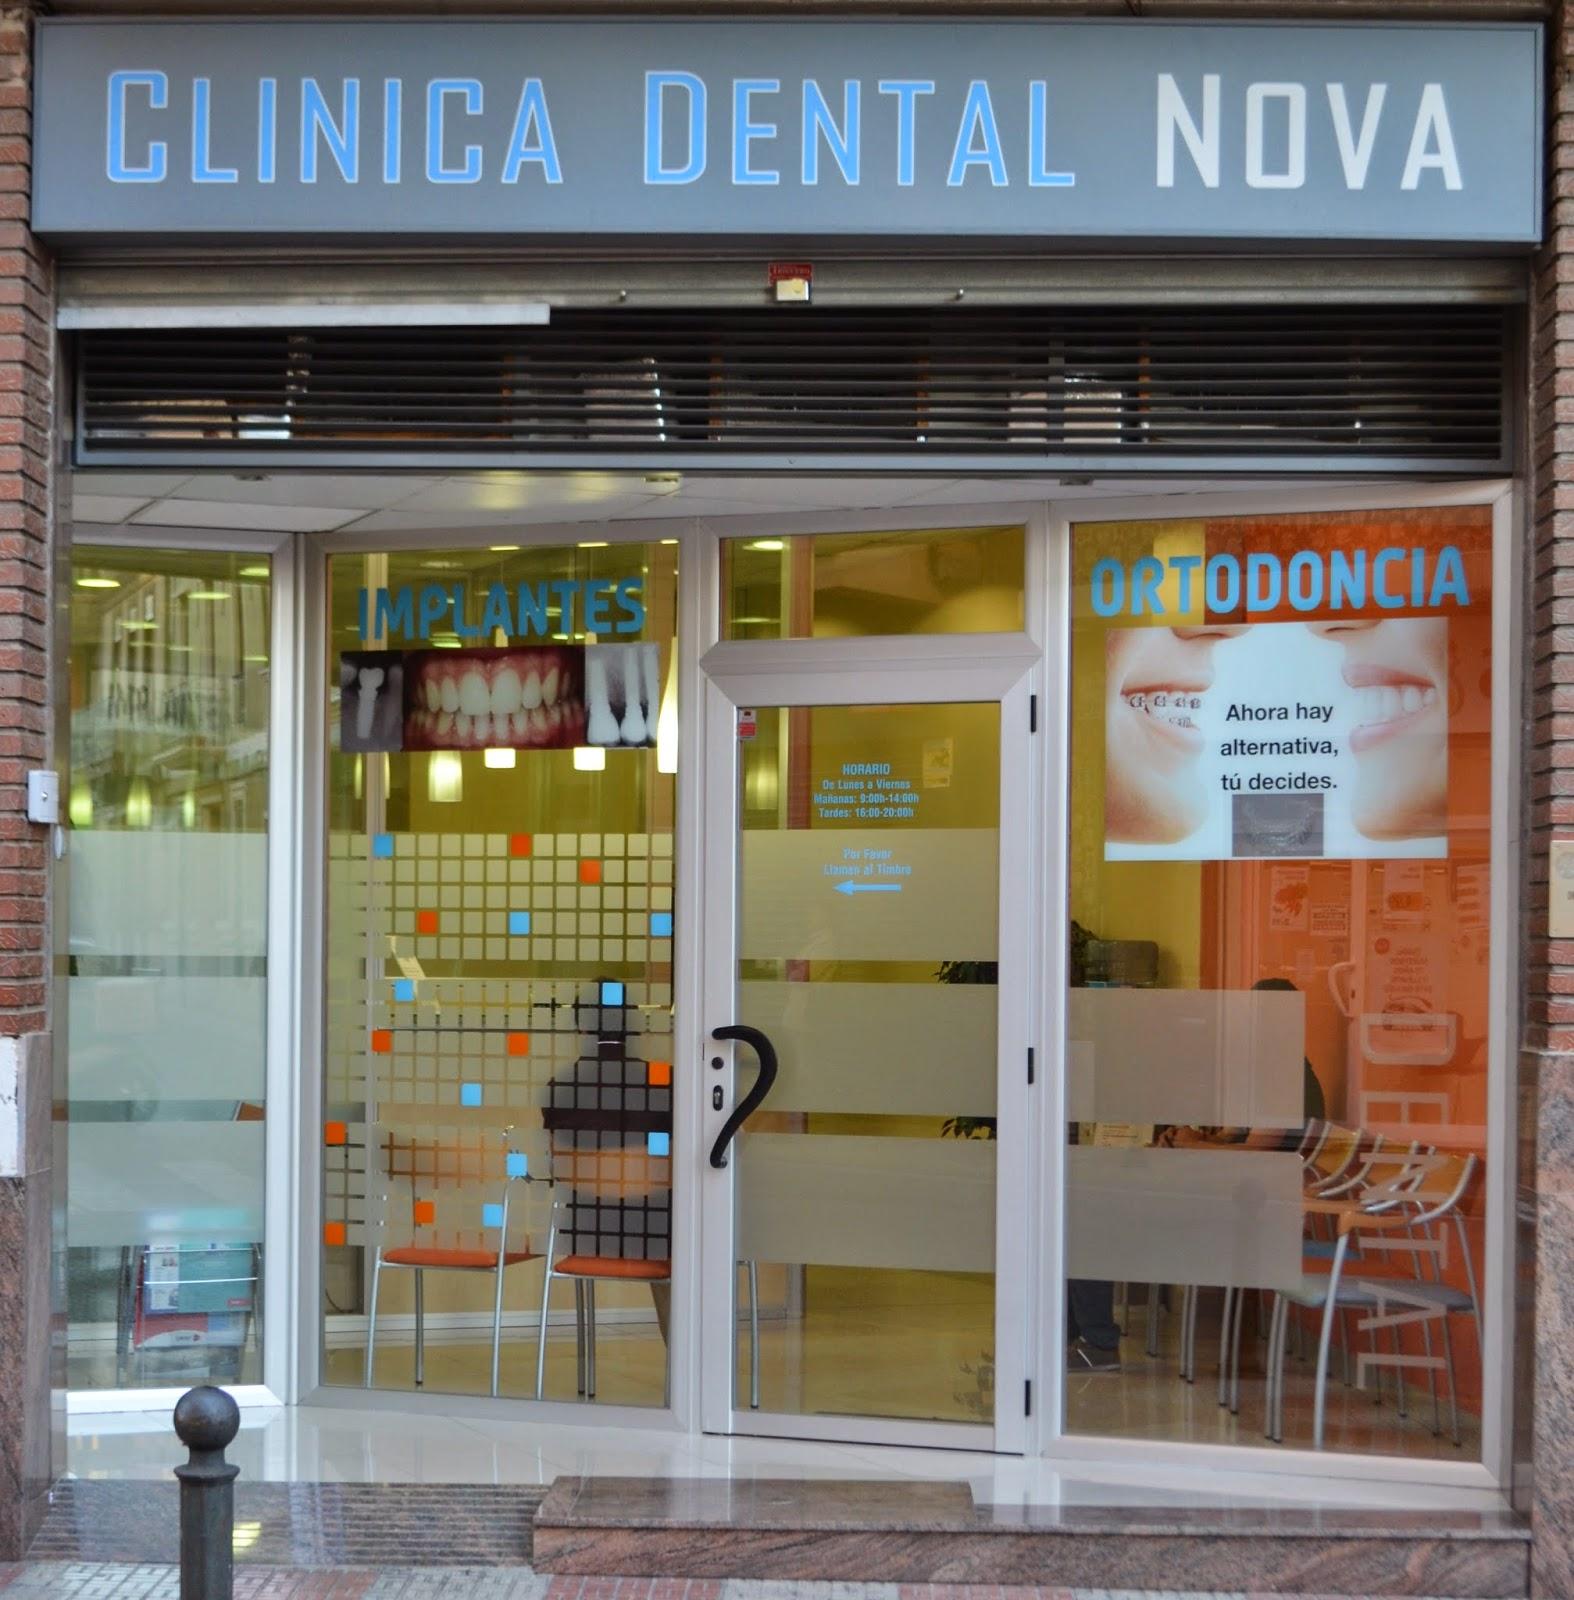 Club pirag isme silla cl nica dental nova apoya el for Clinica dental el escorial